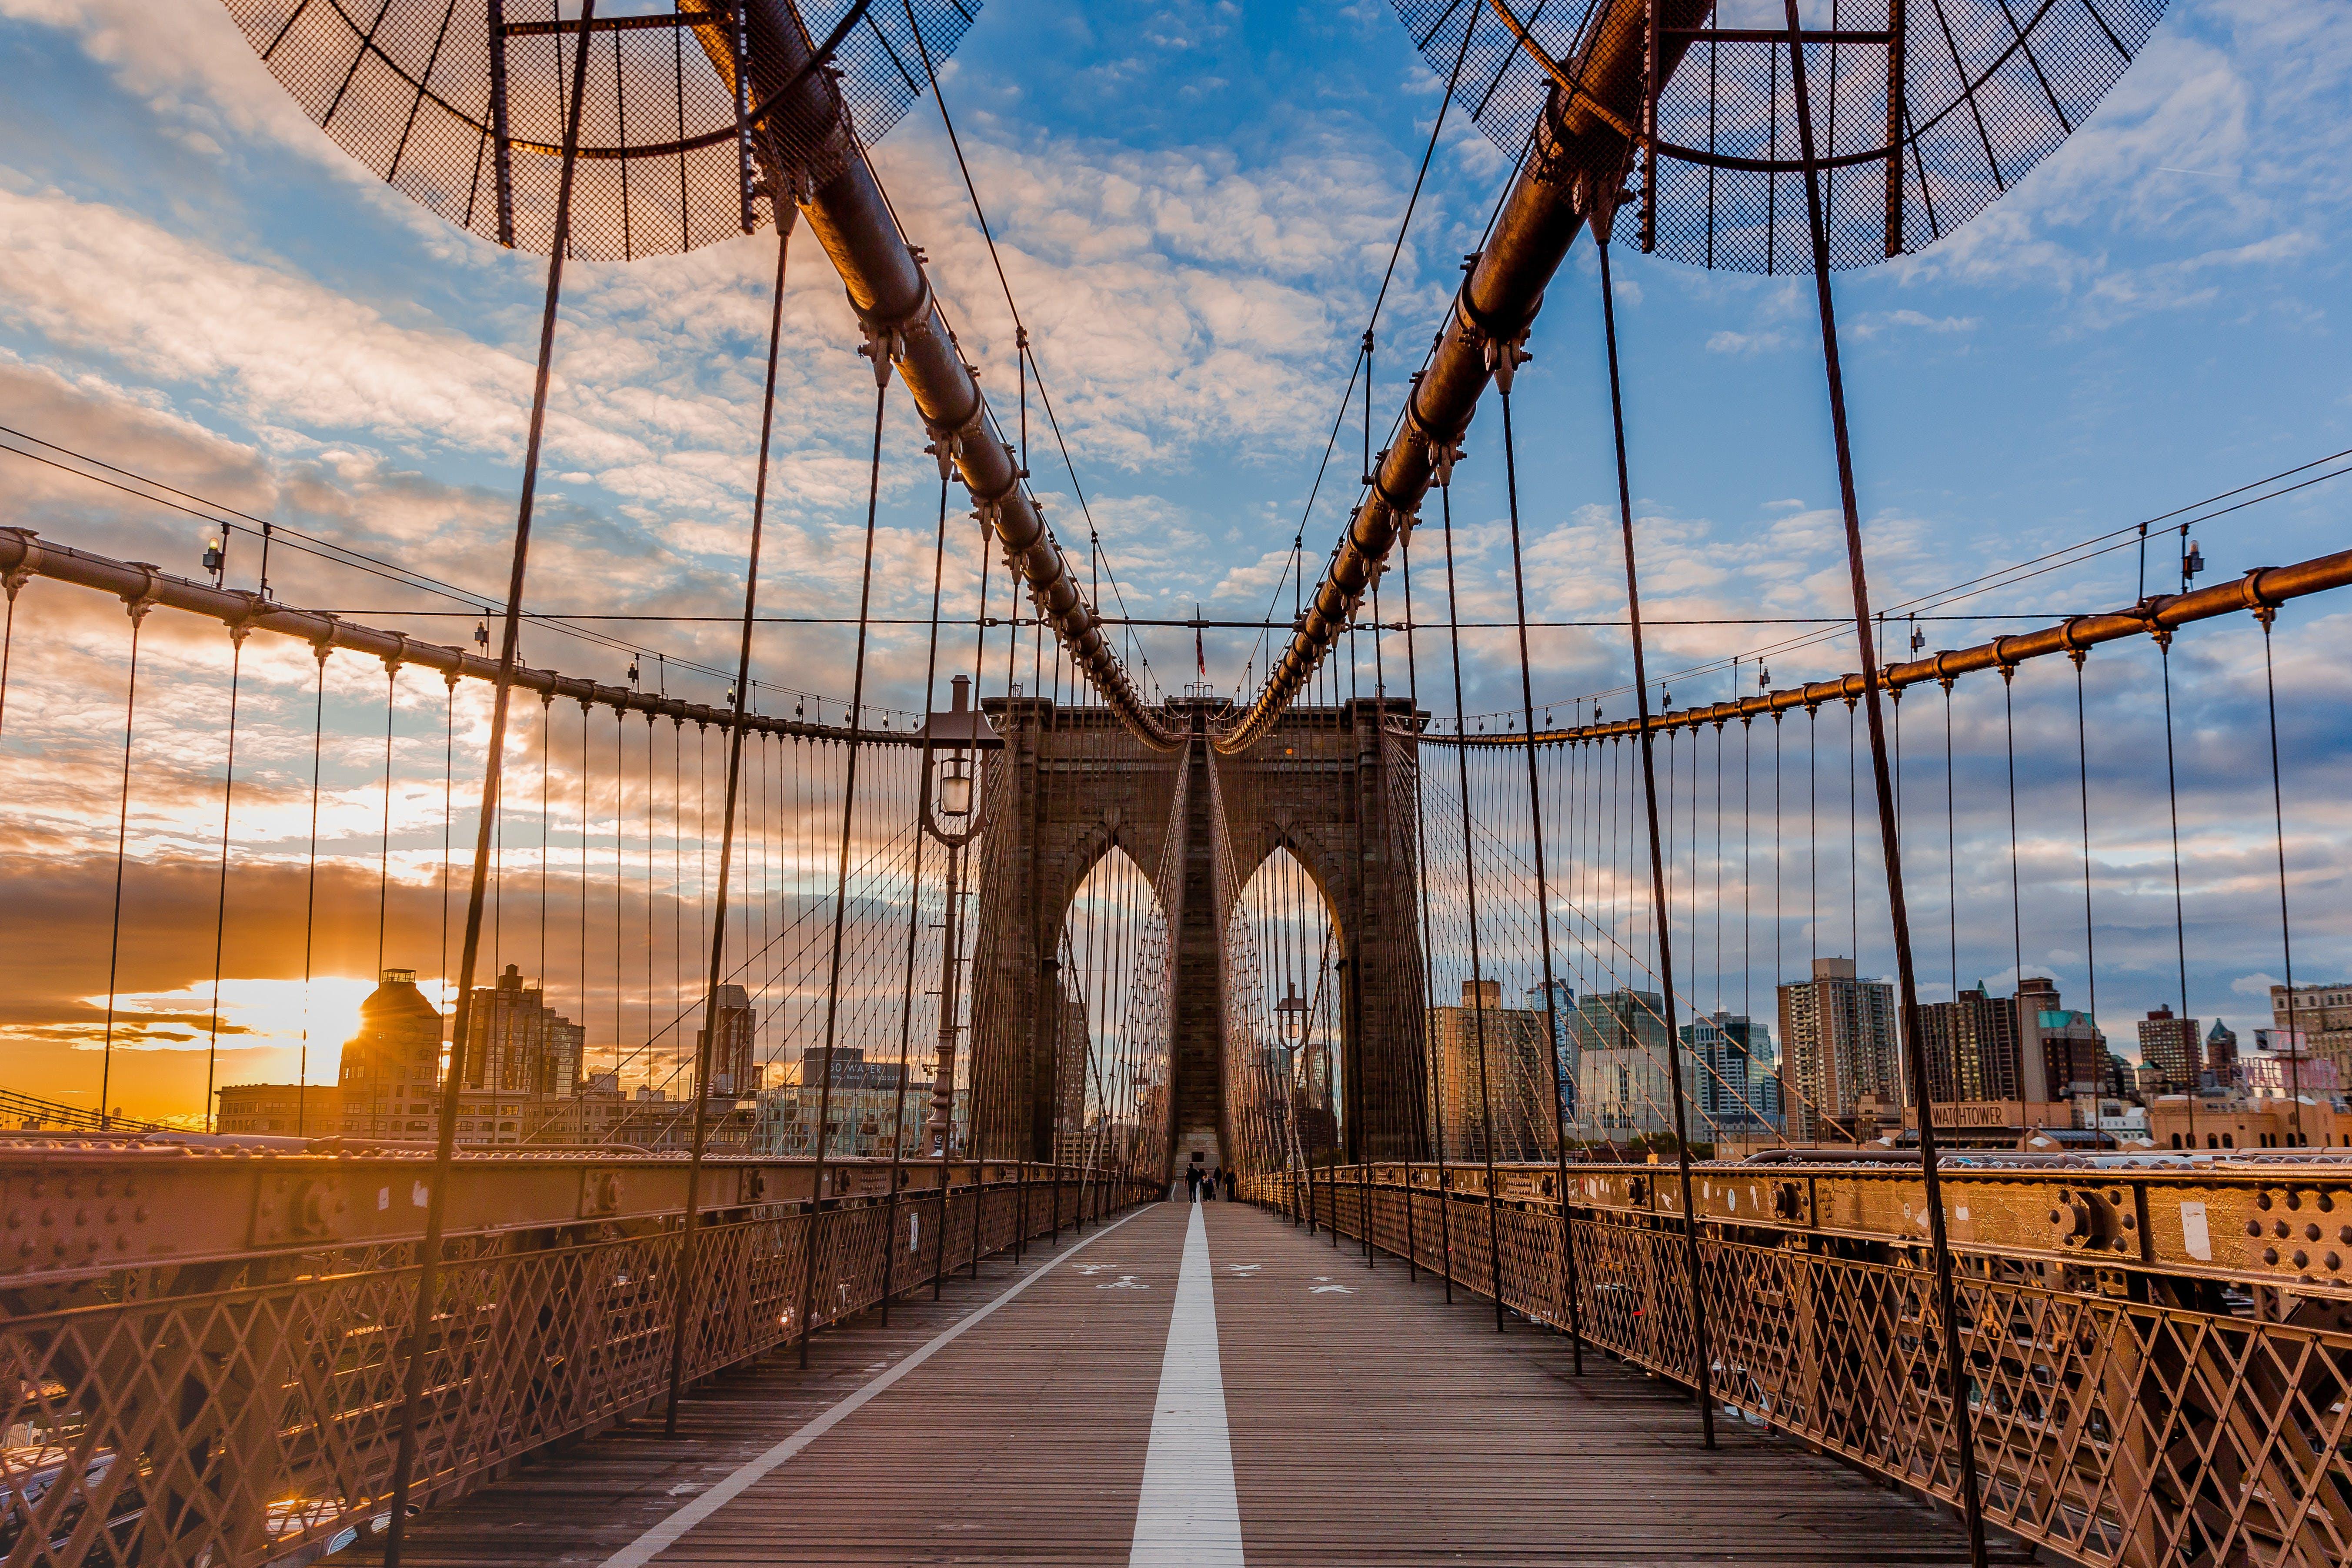 New York Instagram accounts